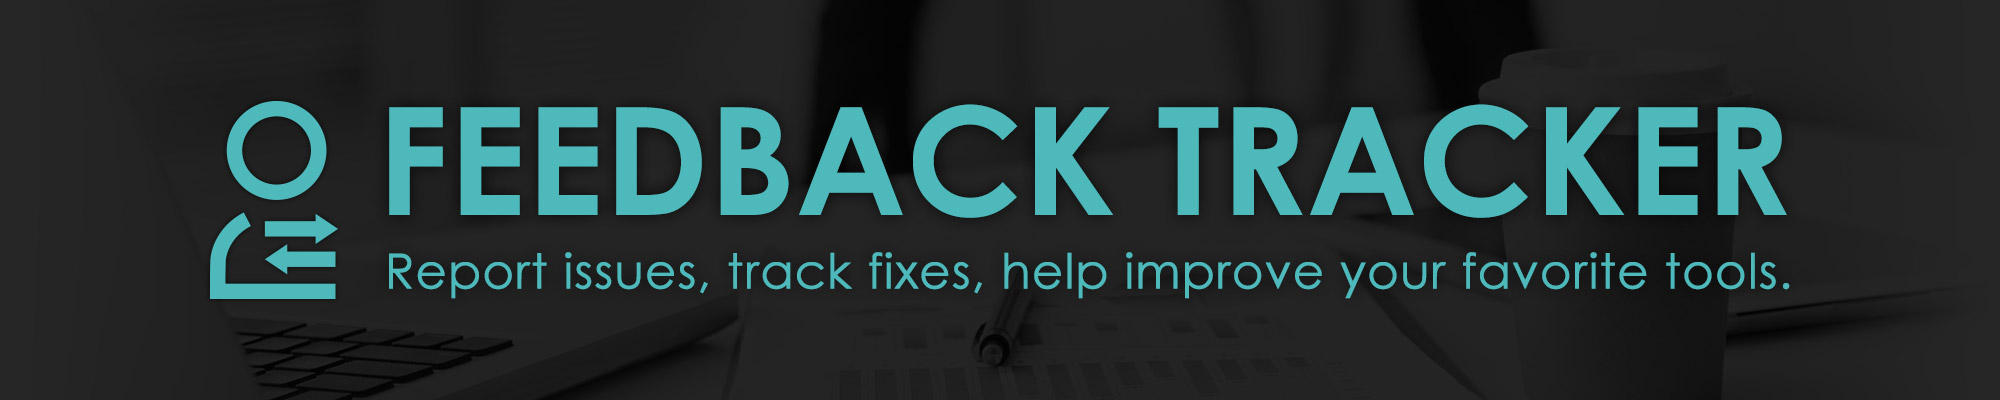 Reallusion-Feedback Tracker